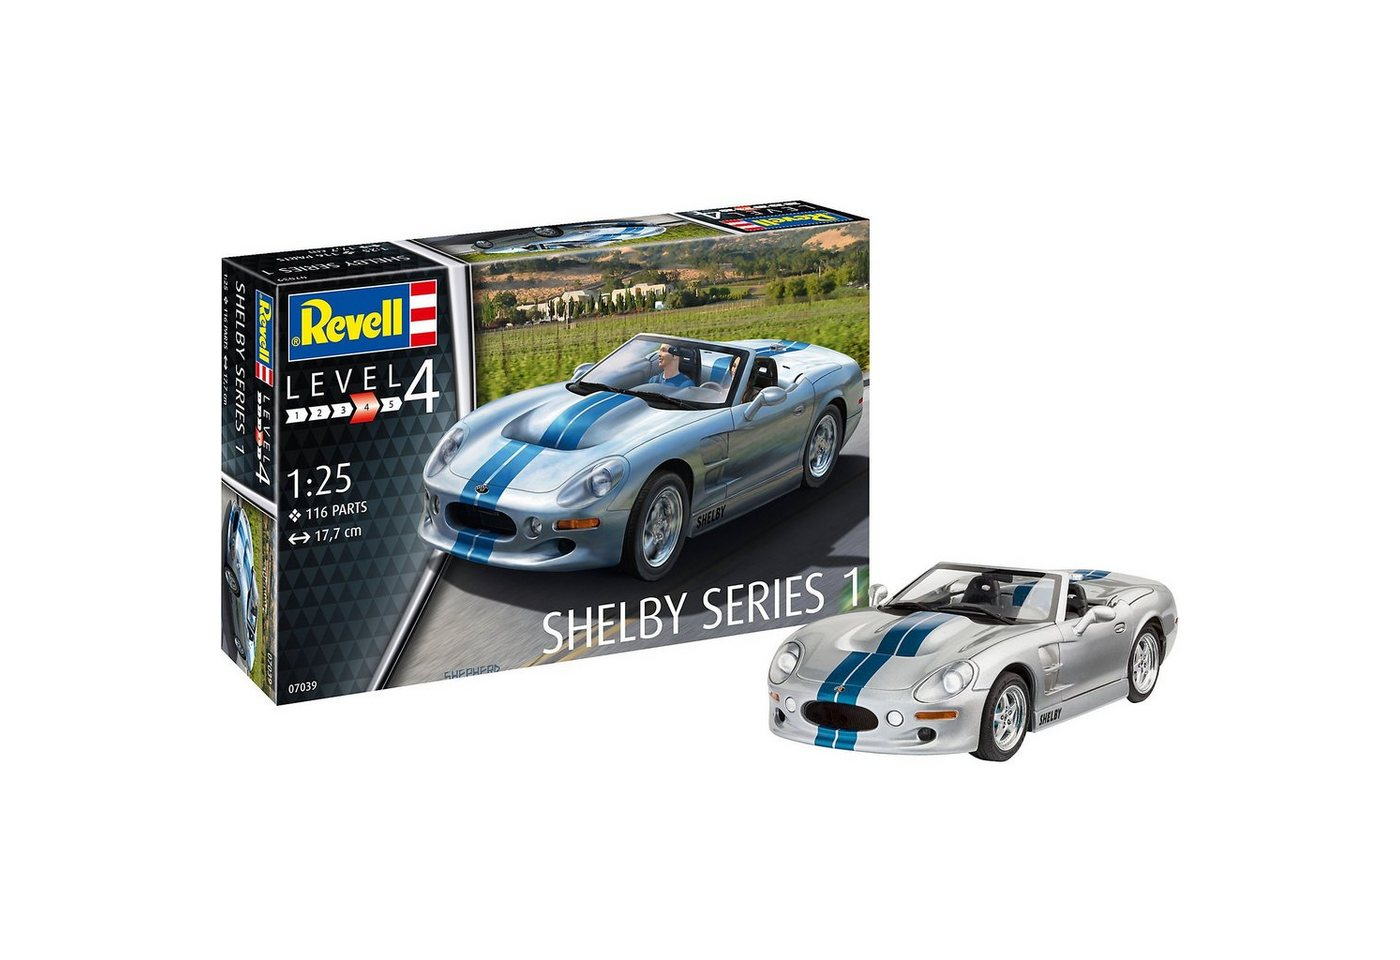 Revell® Modellbausatz Shelby Series I